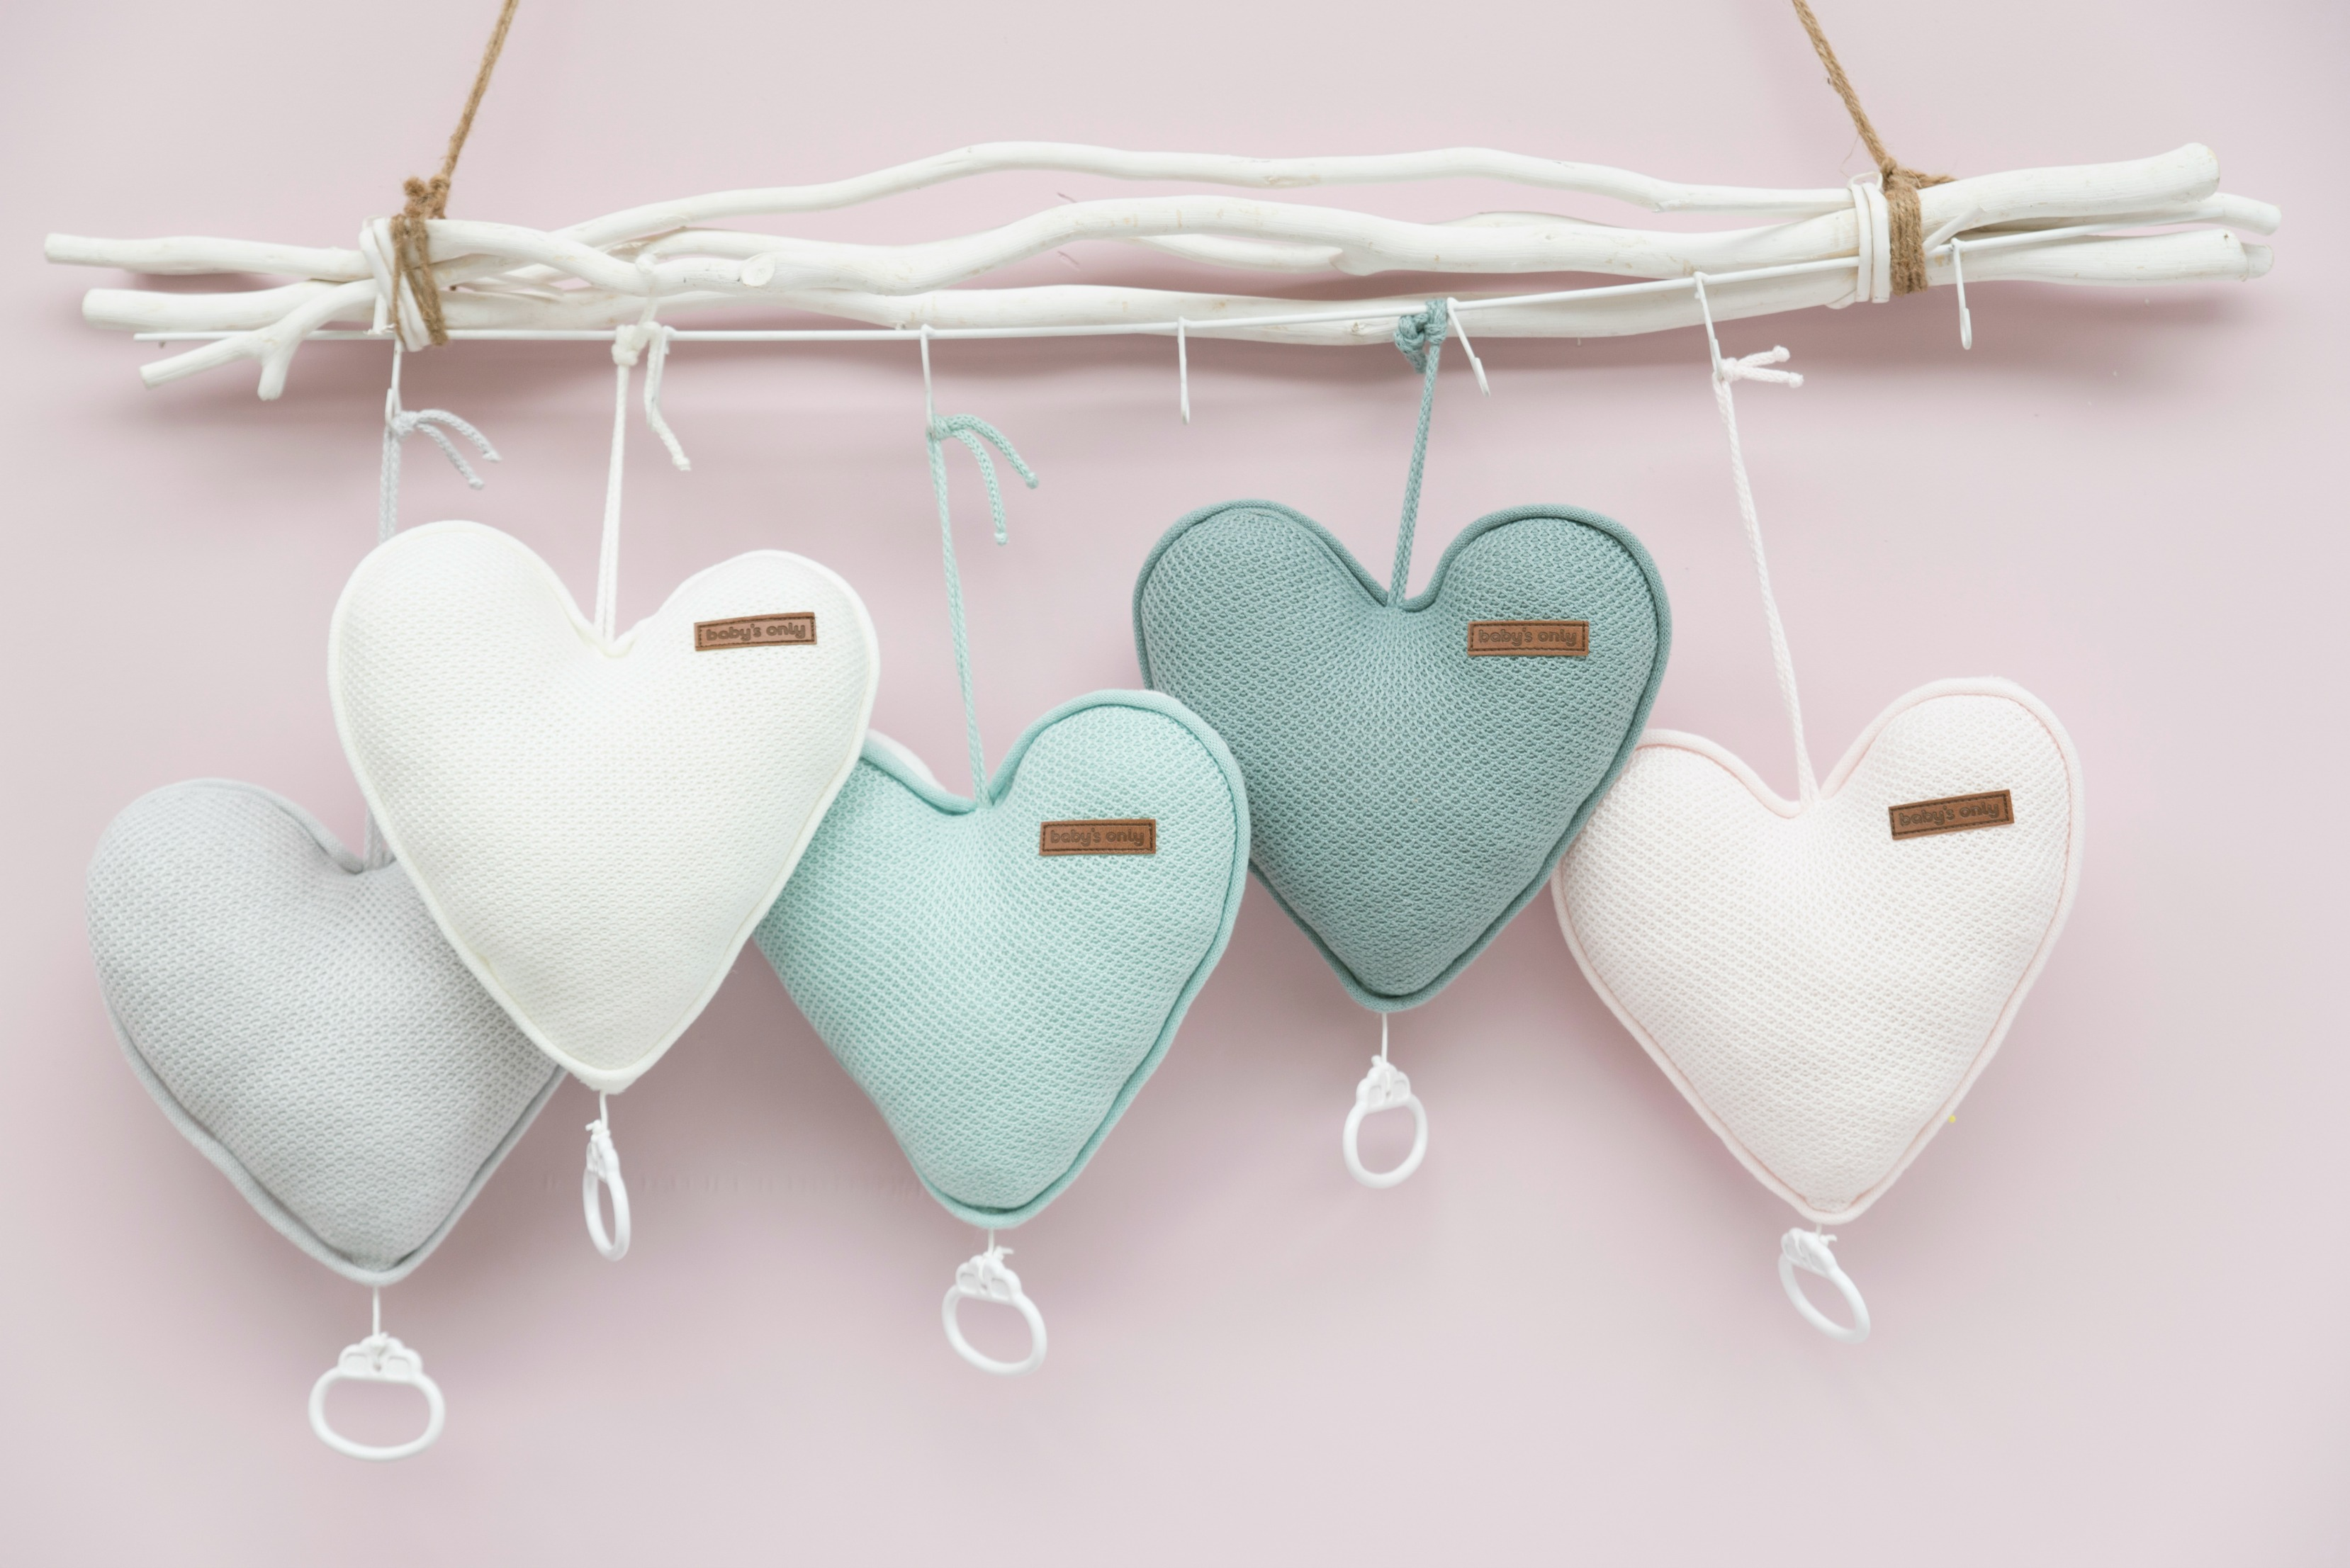 klassieke kinderkleding-mintgroen-babykamer-pasteltinten babykamer